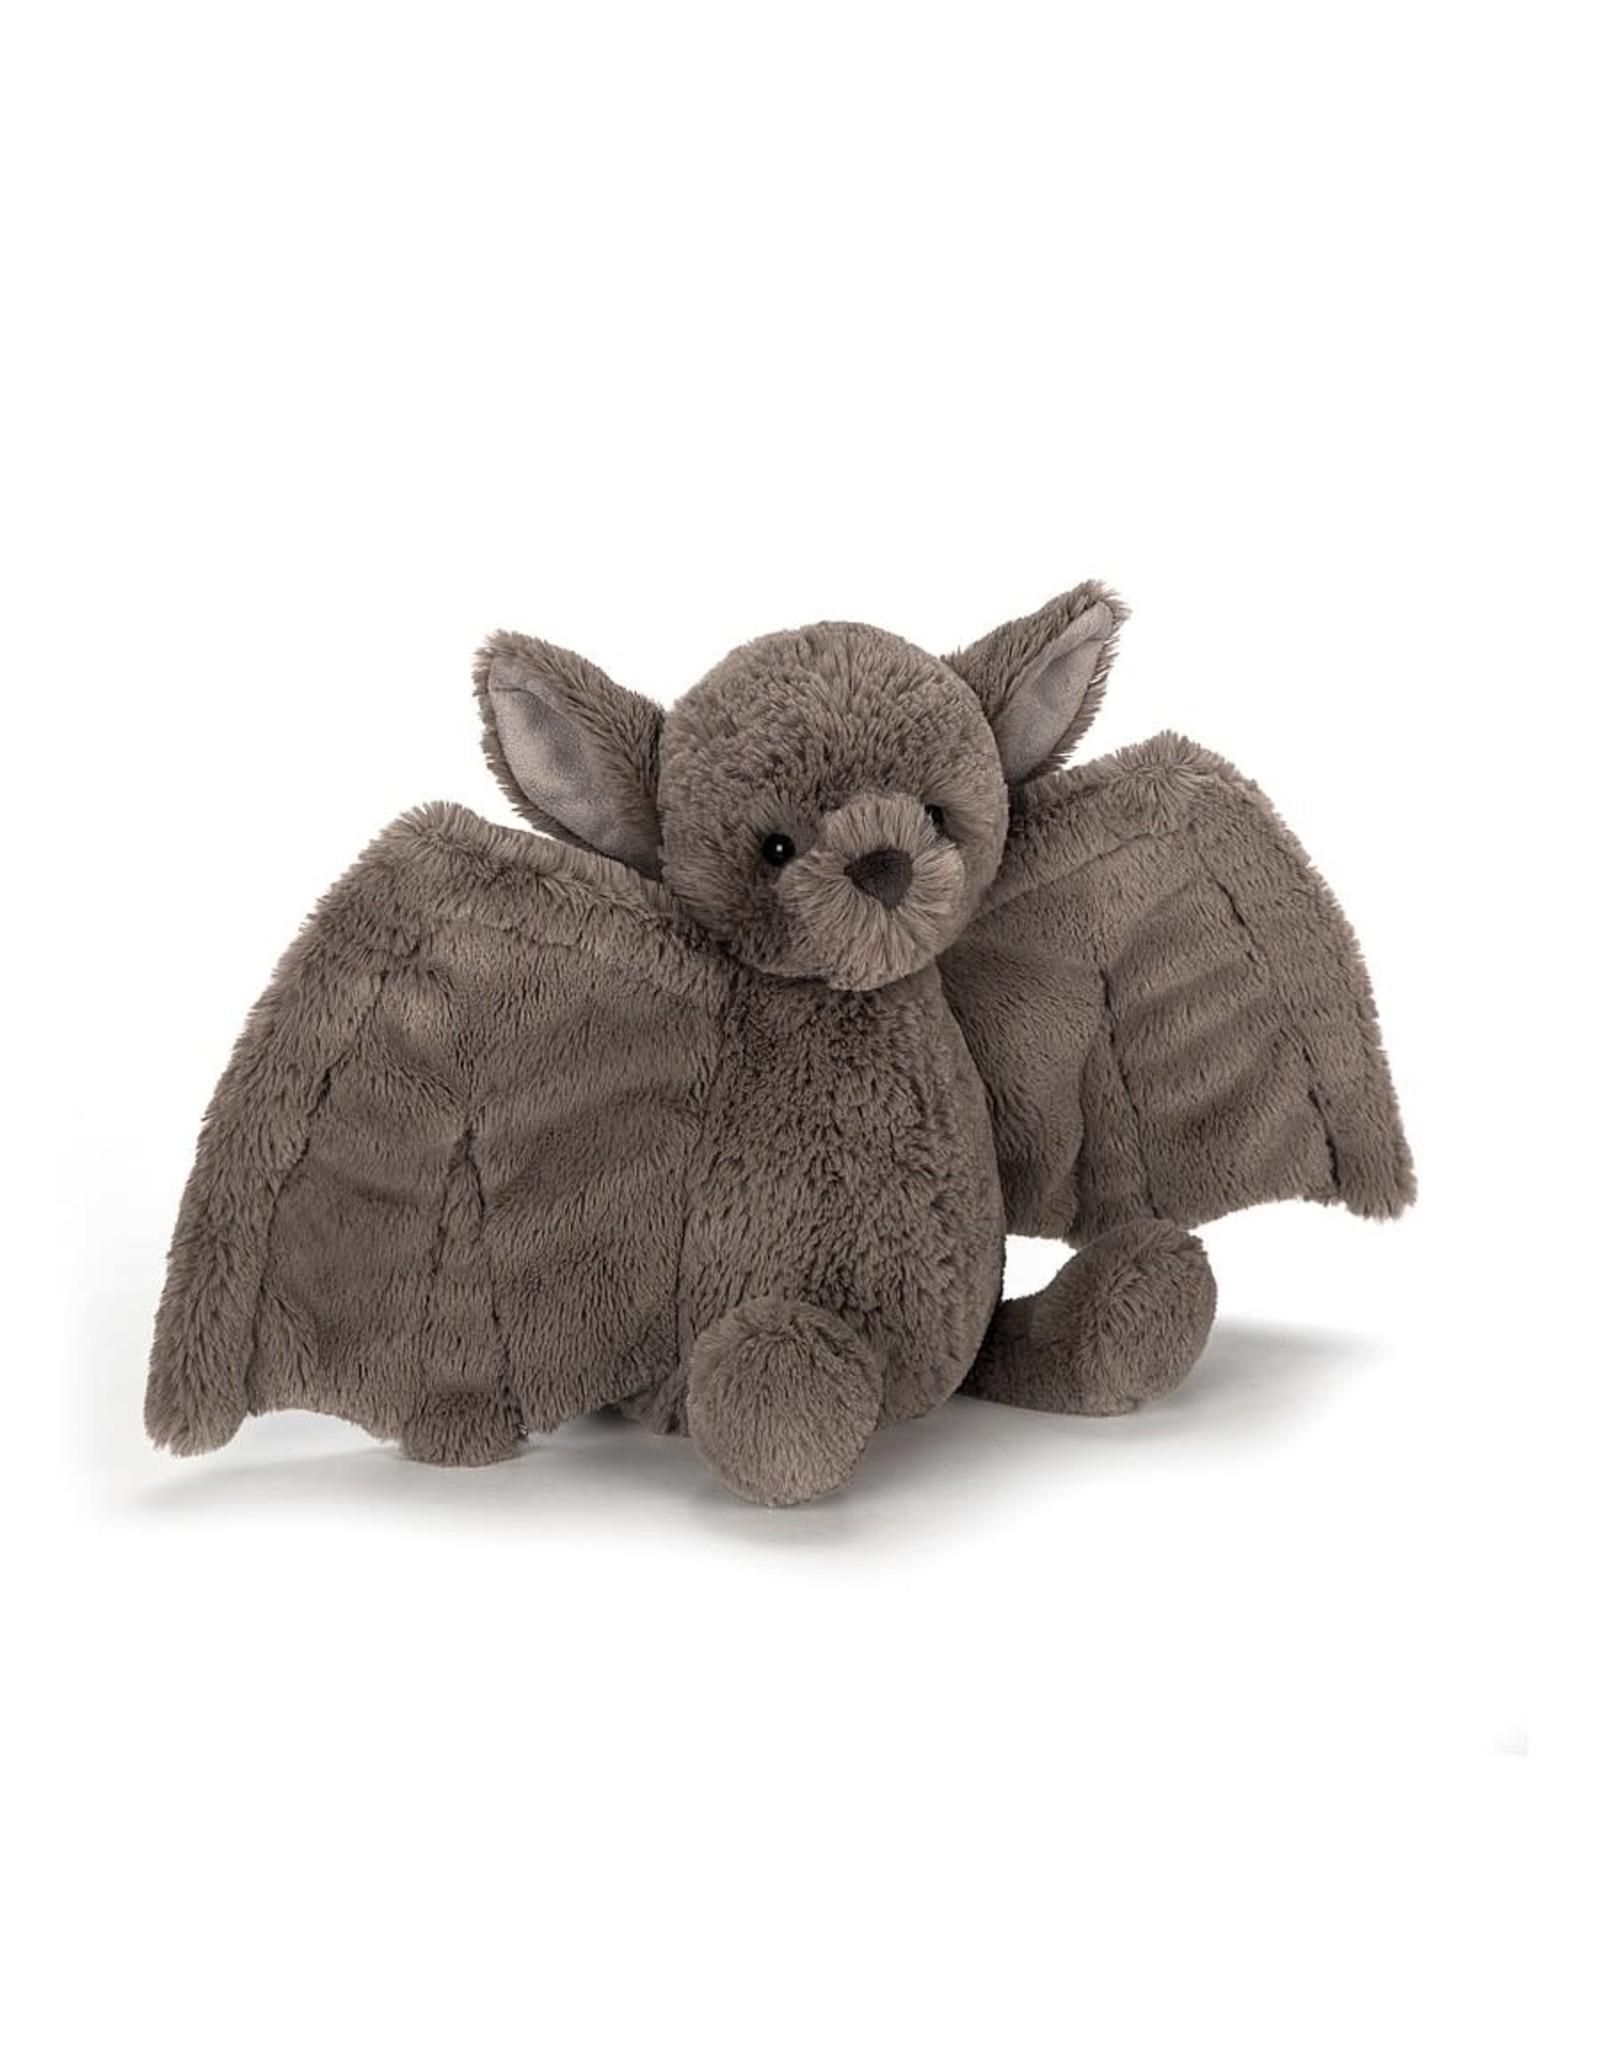 JELLYCAT JELLYCAT BASHFUL BAT SMALL